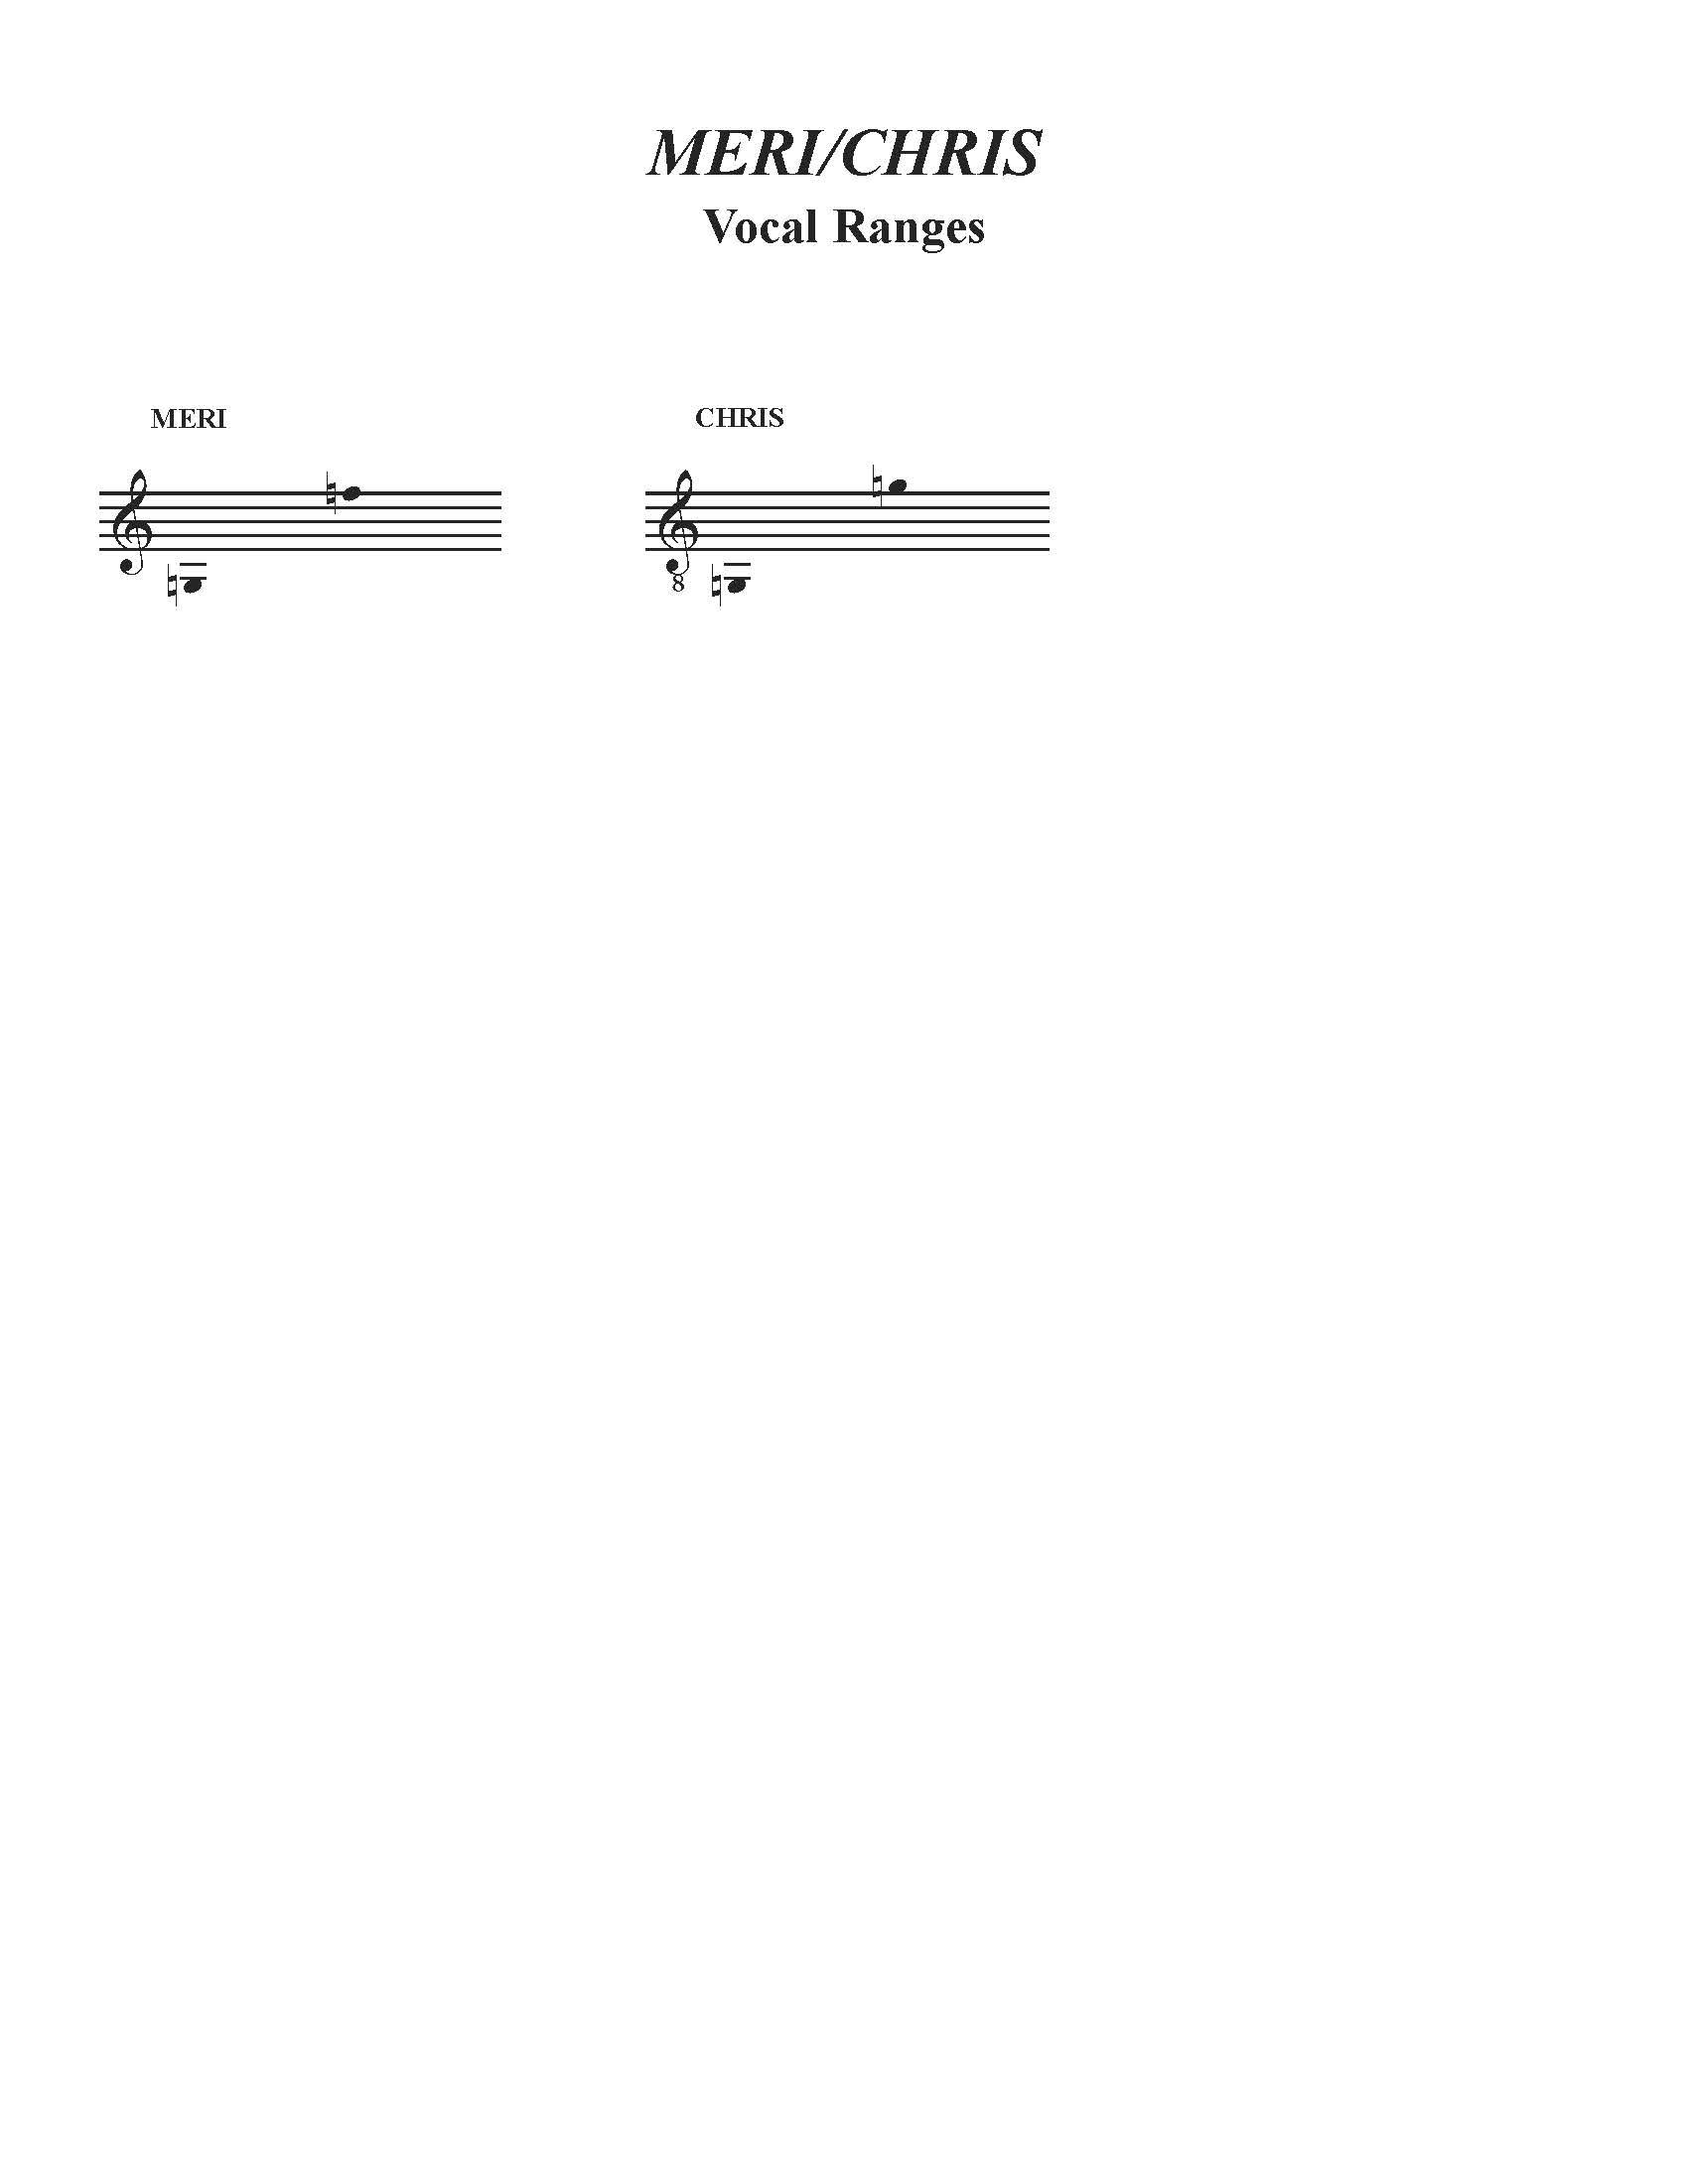 MERI/CHRIS: A Modern Magi Musical Stay-At-Home Vocal Ranges